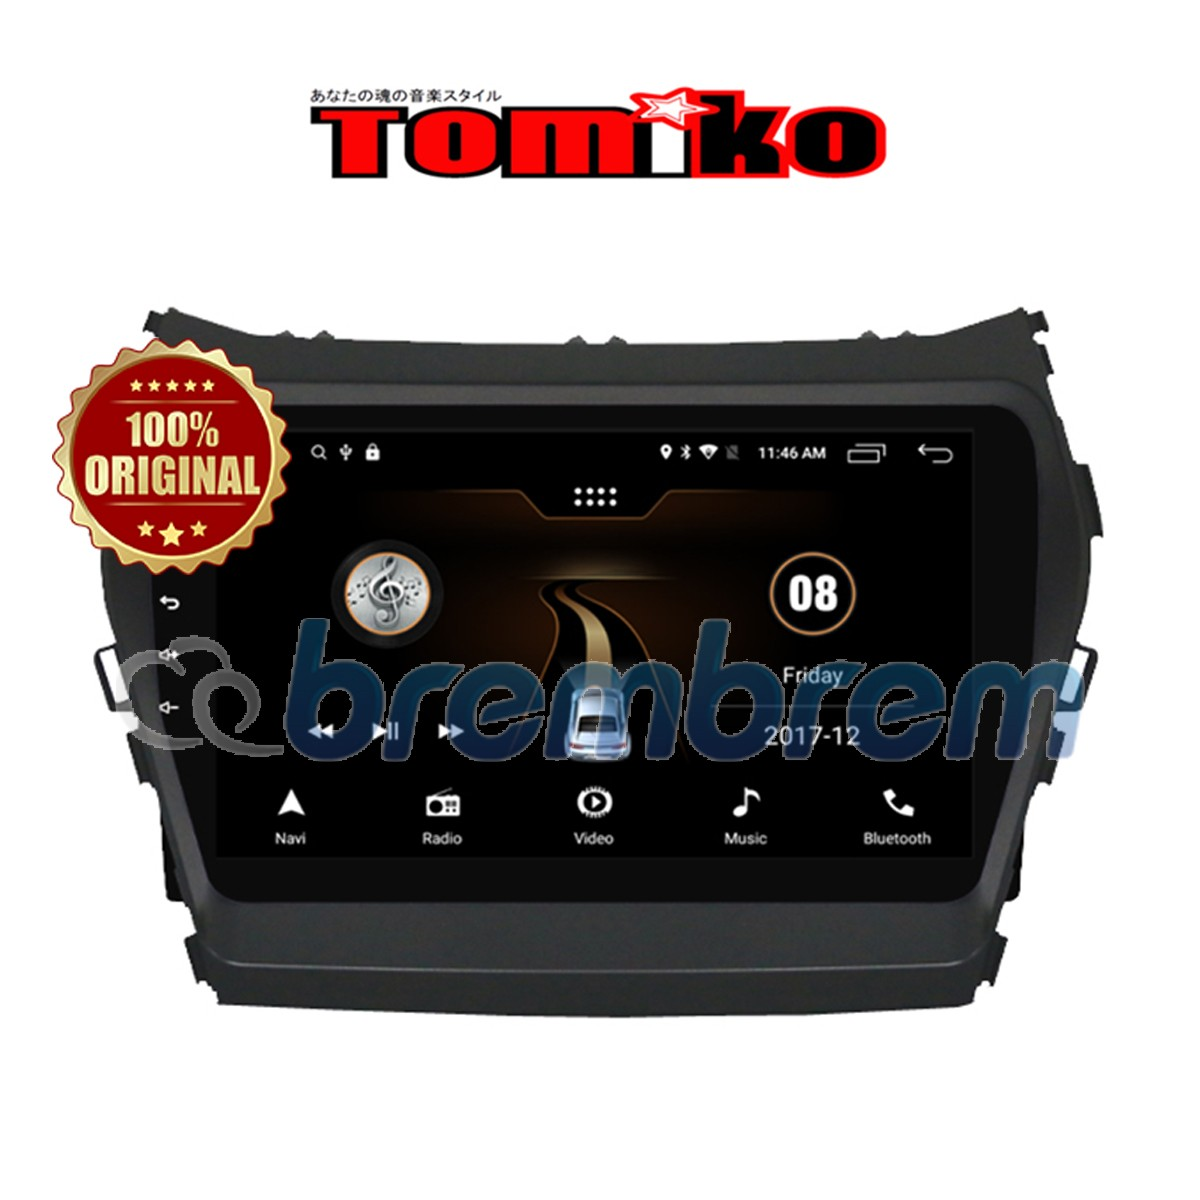 TOMIKO ANDROID 4G LTE HYUNDAI SANTA FE IX45 - HEADUNIT OEM